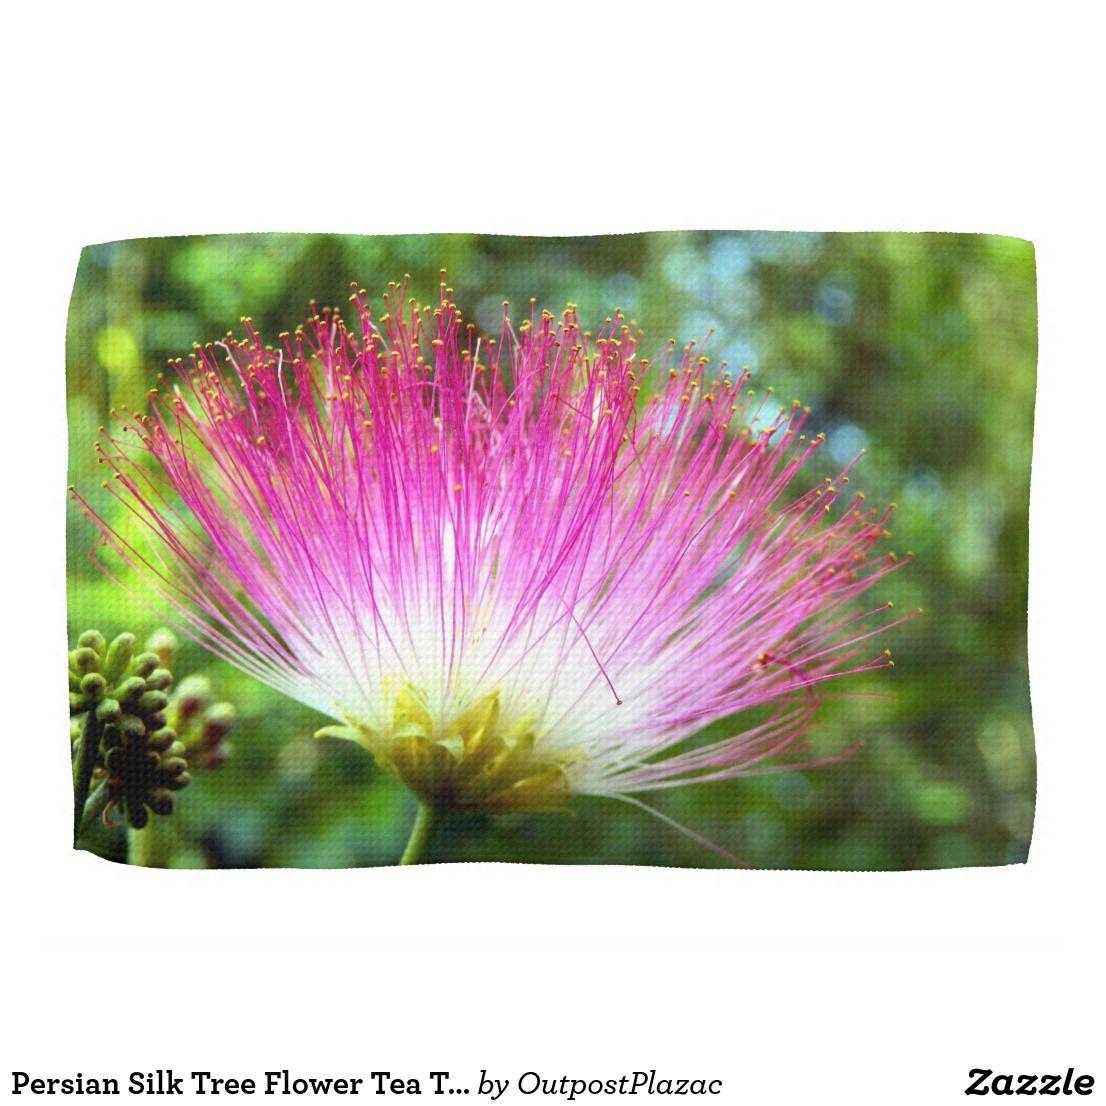 Persian Silk Tree Flower Tea Towels Pinterest Persian Silk Tree